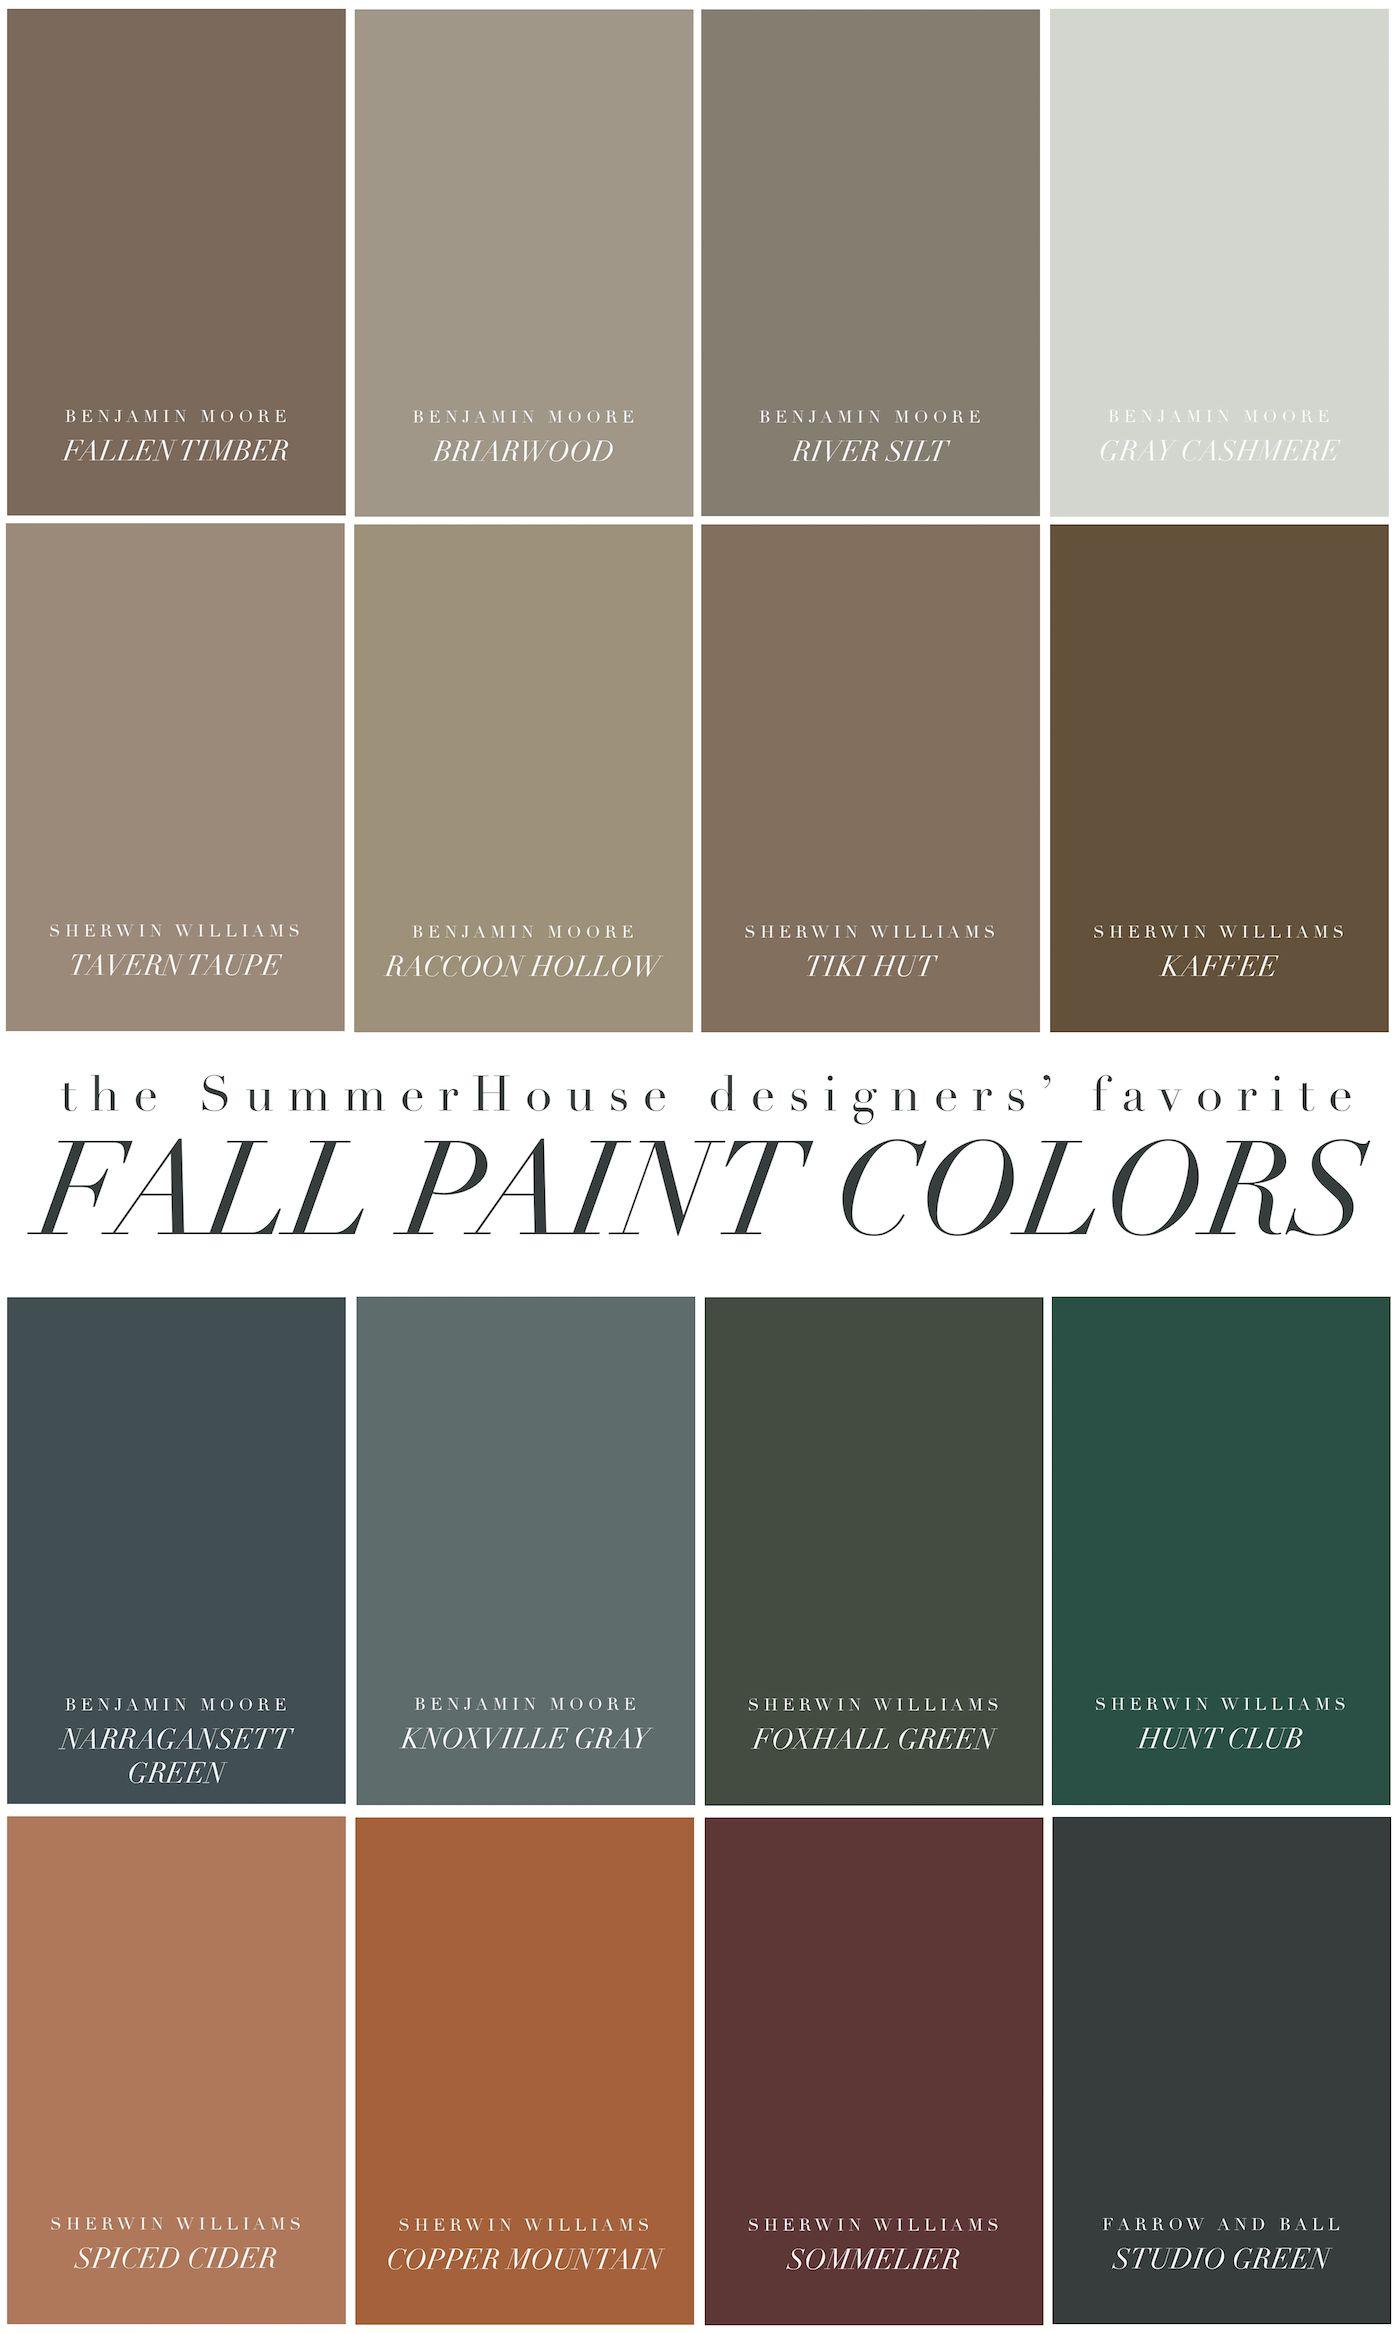 Our Favorite Fall Paint Colors Fall Paint Colors Autumn Painting Paint Colors